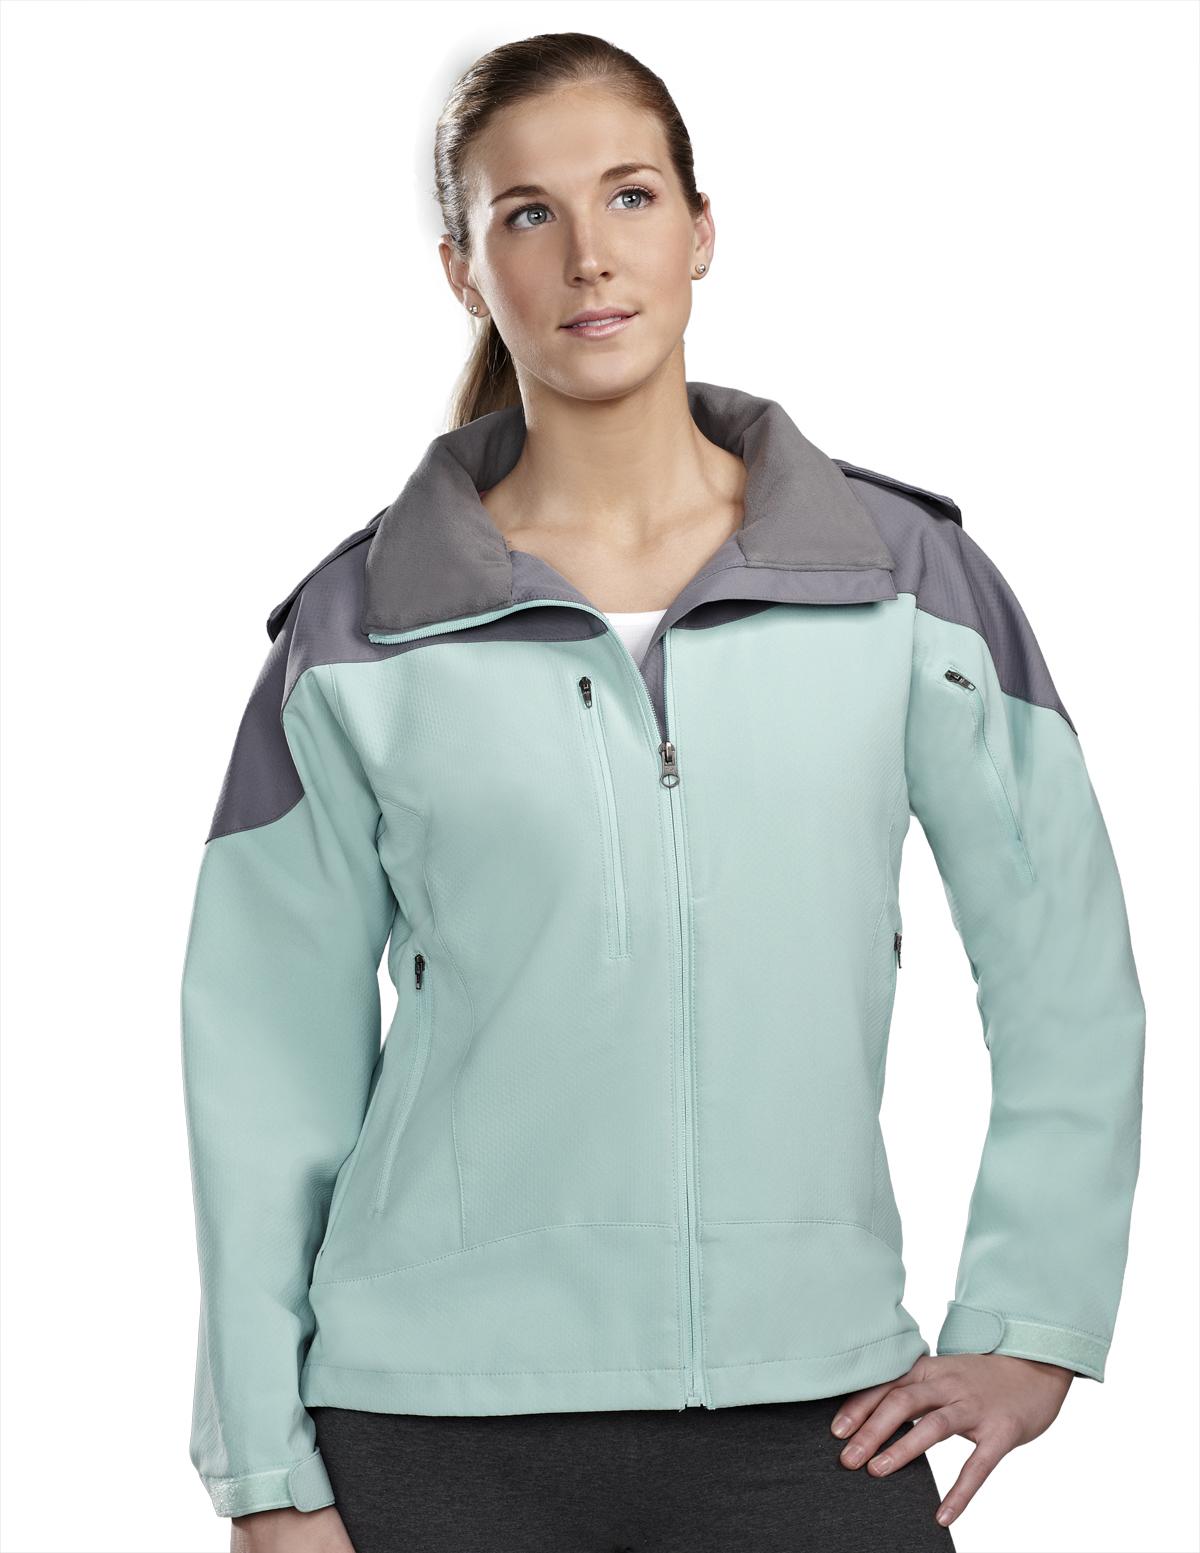 Tri-Mountain Portland 6320 Poly Stretch Bonded Hooded Jacket, 2X-Large, Aqua/Gray/Gray